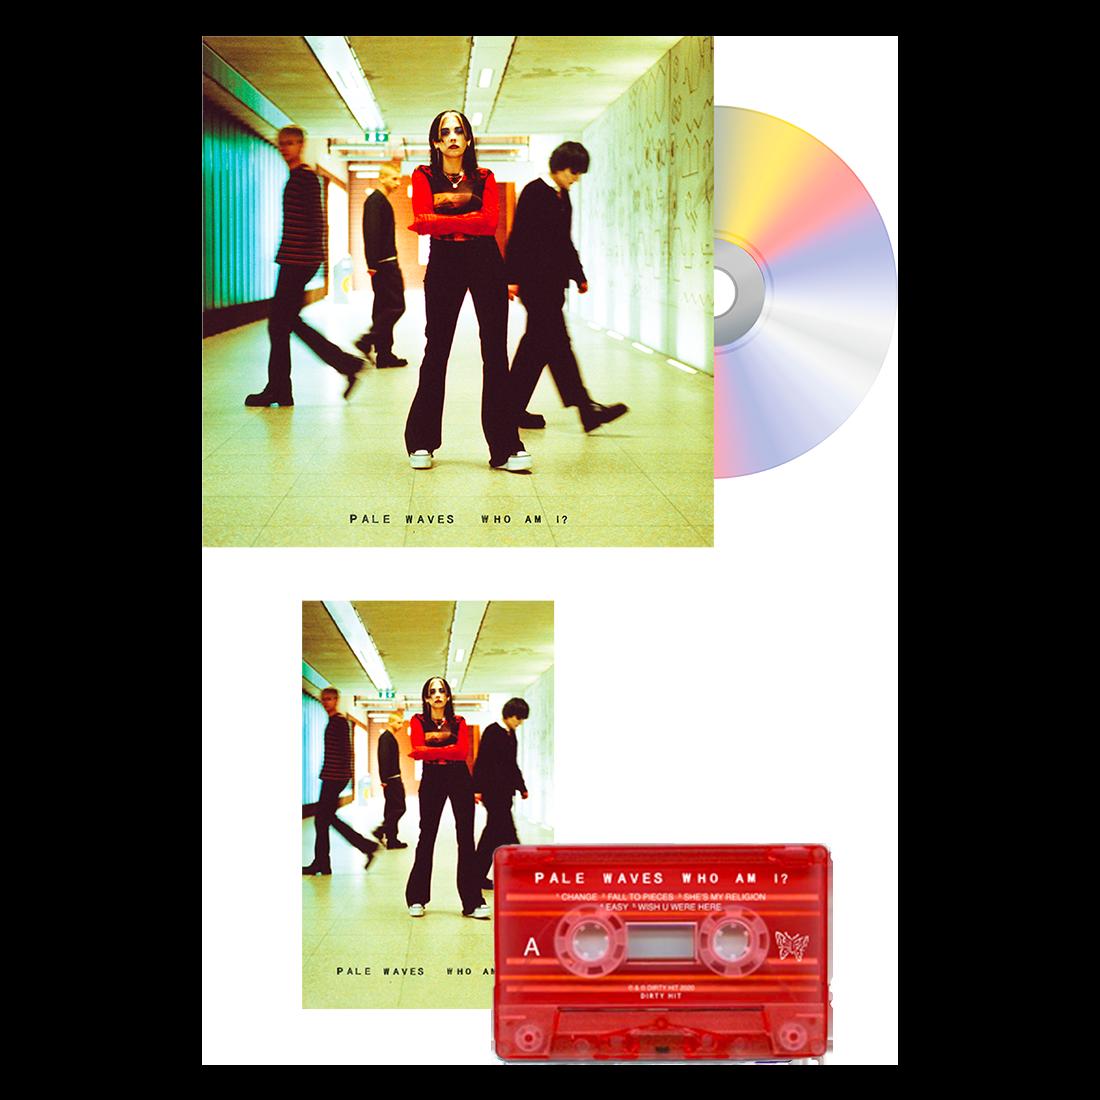 Pale Waves: Who Am I? - CD bundle (Signed)